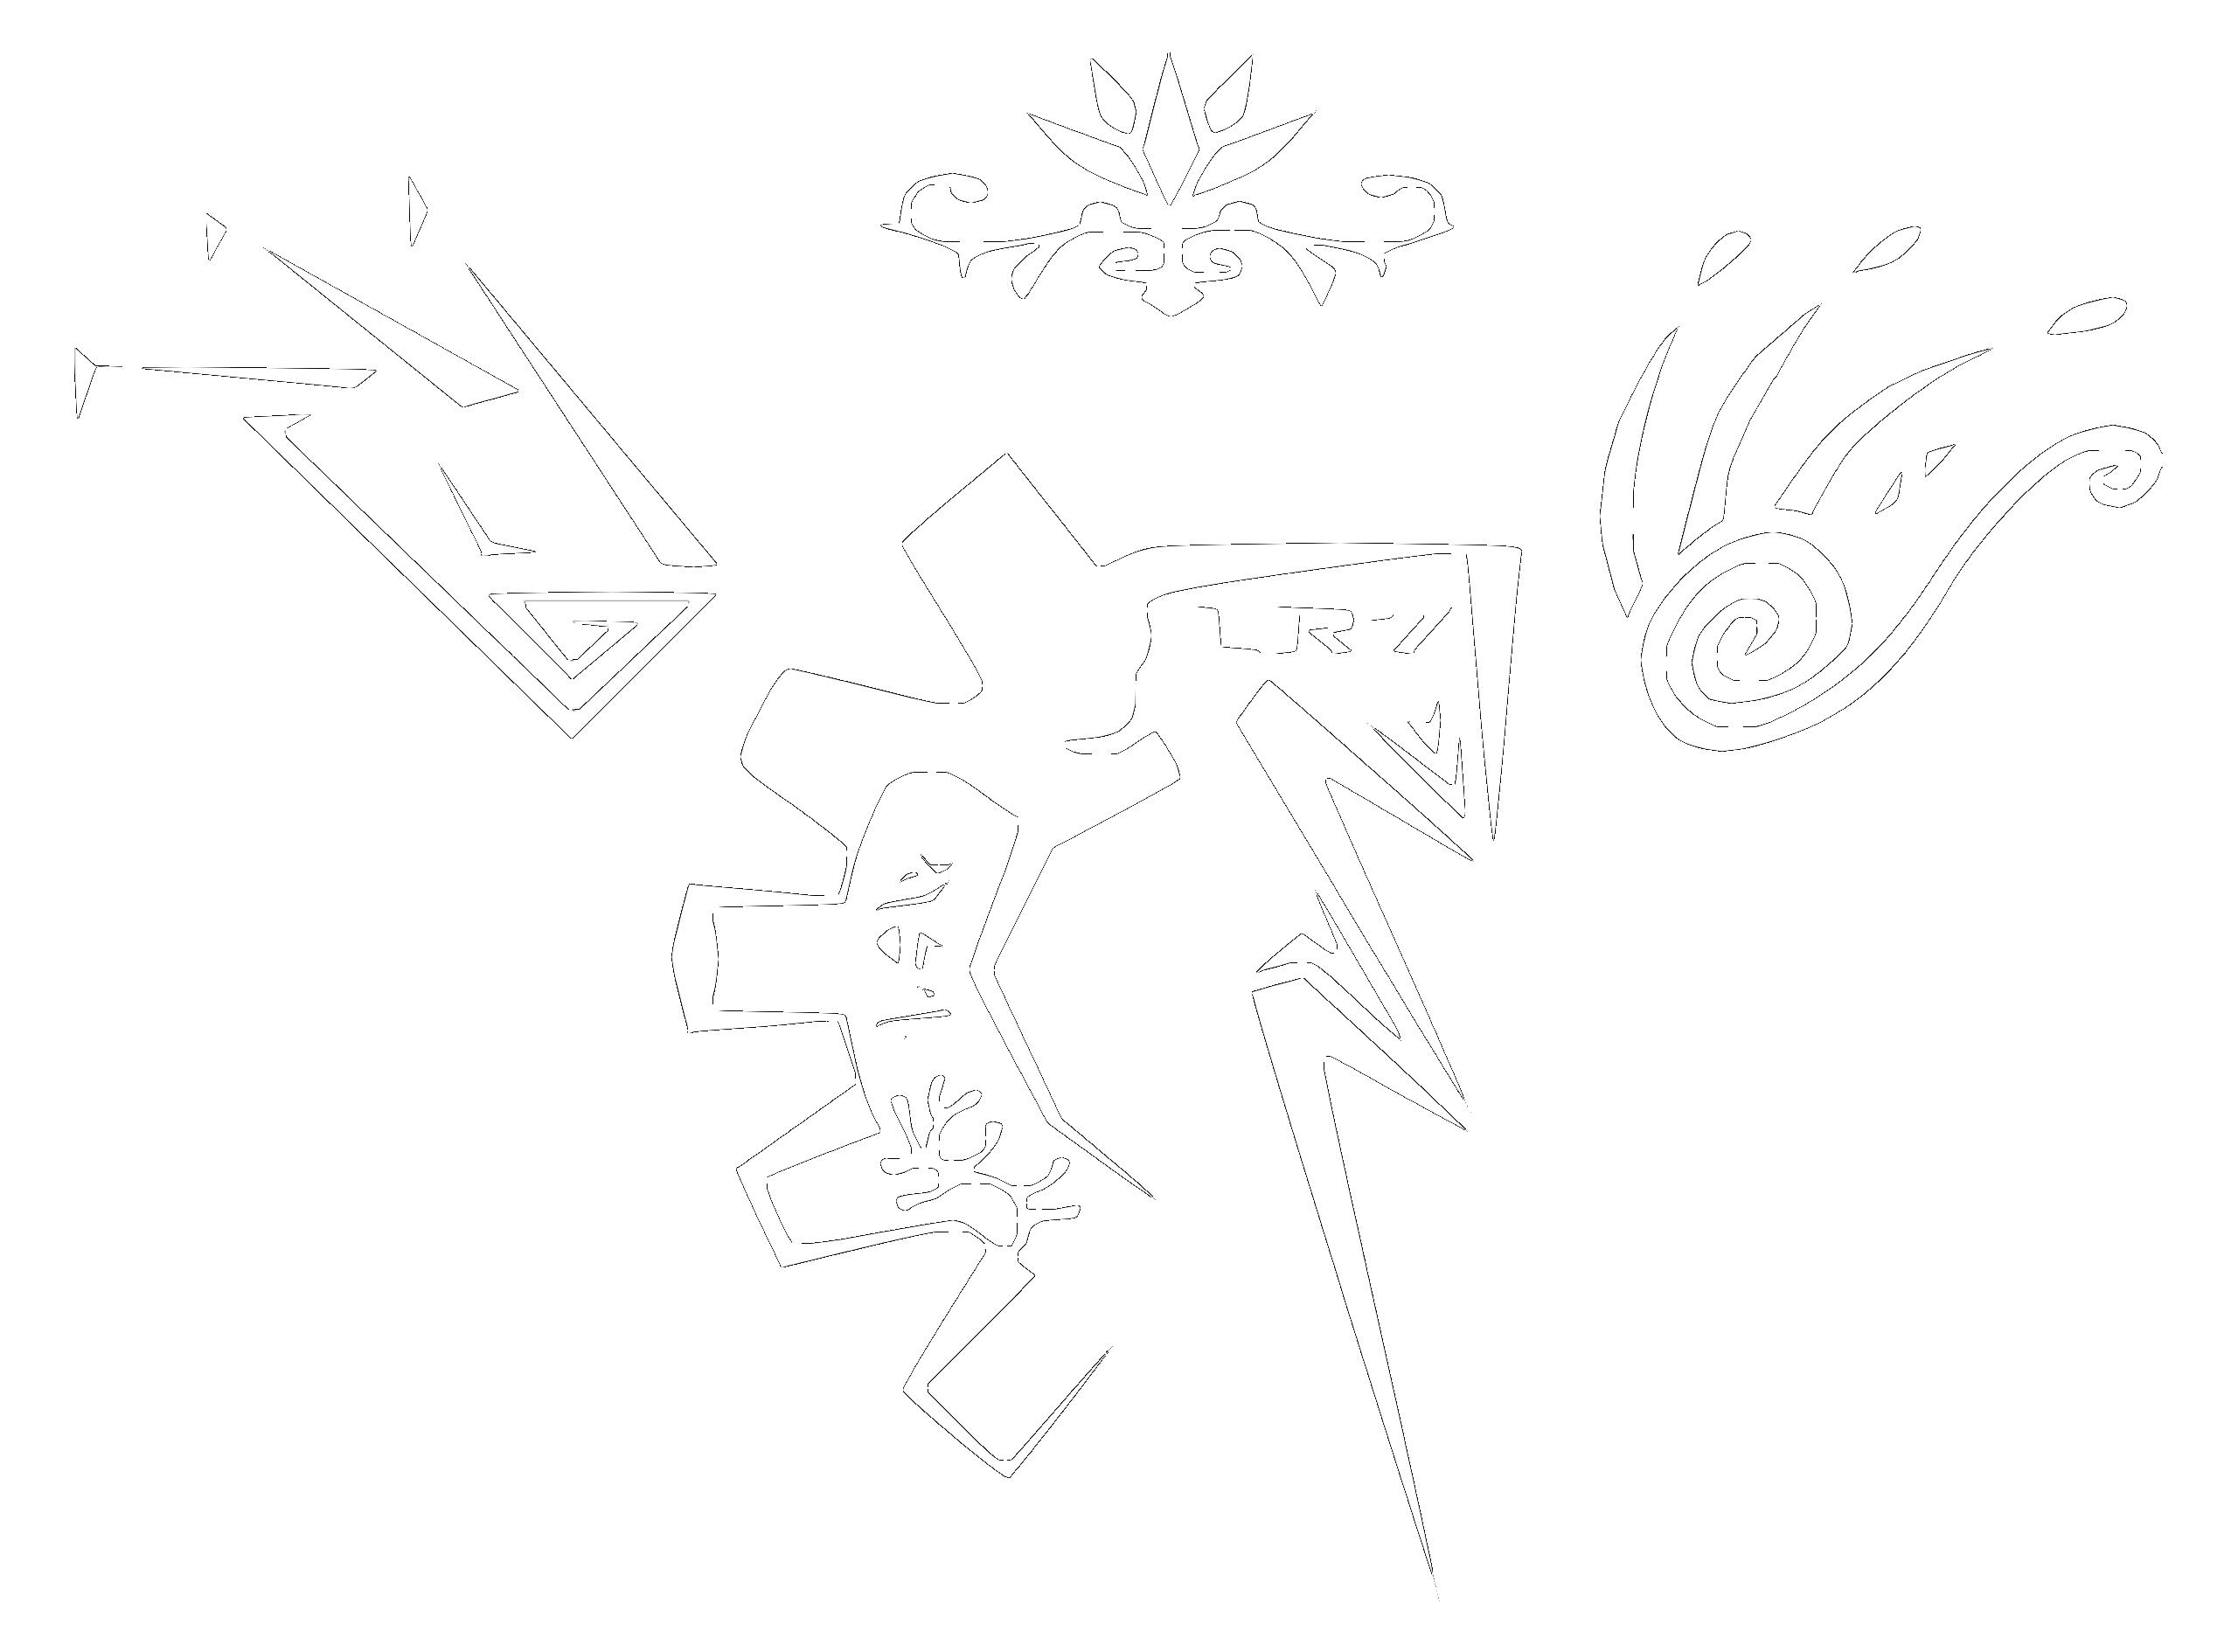 Land Riders leacy current symbols